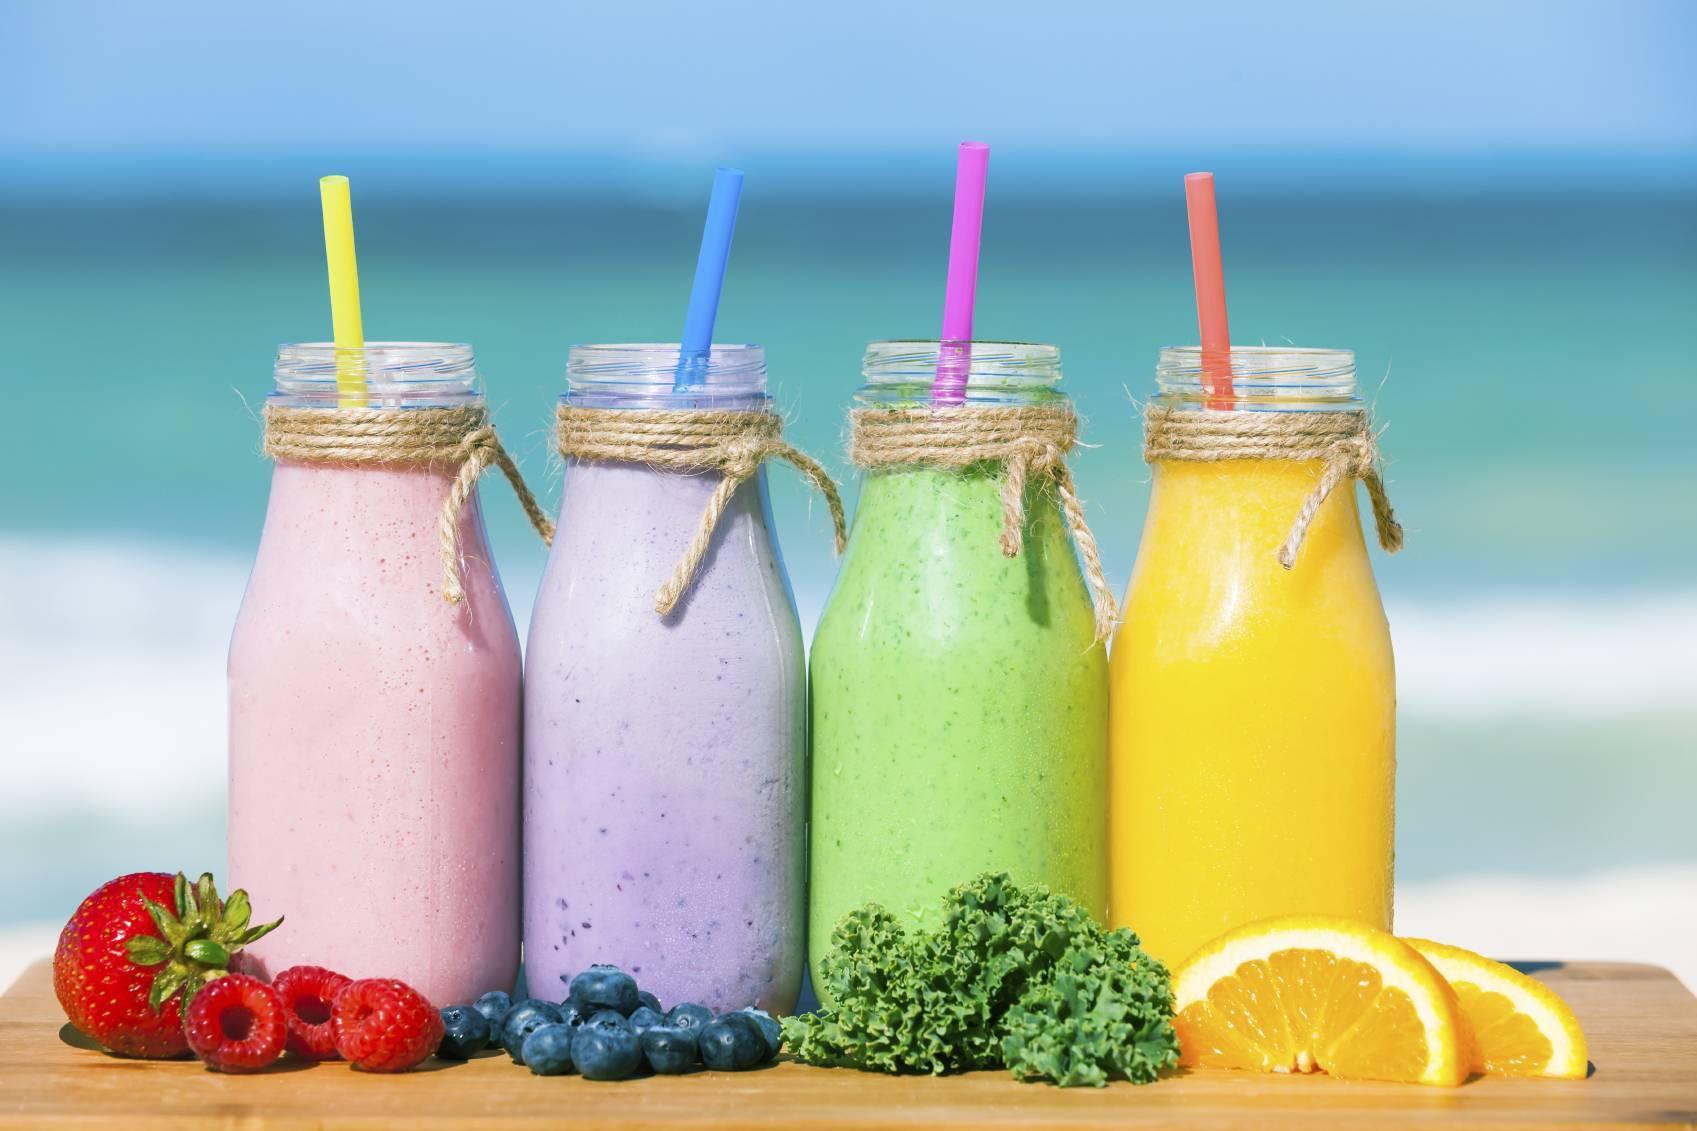 Healthy Smoothies Recipe  7 Healthy Smoothie Recipes